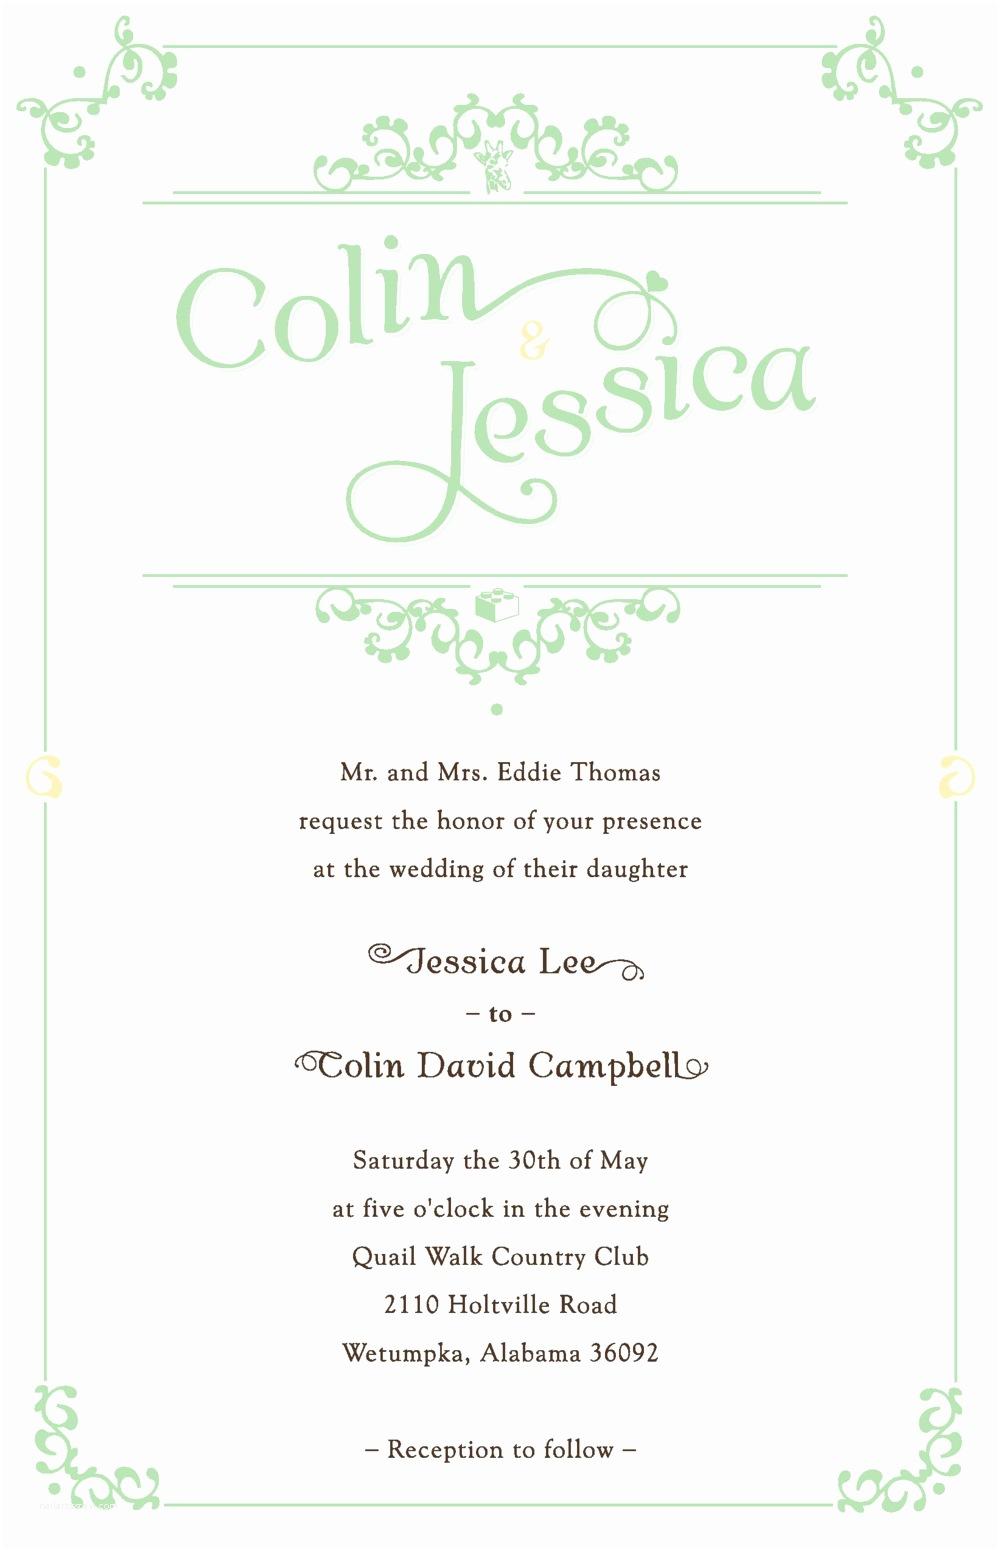 Personal Wedding Invitation Campbell Design Shop